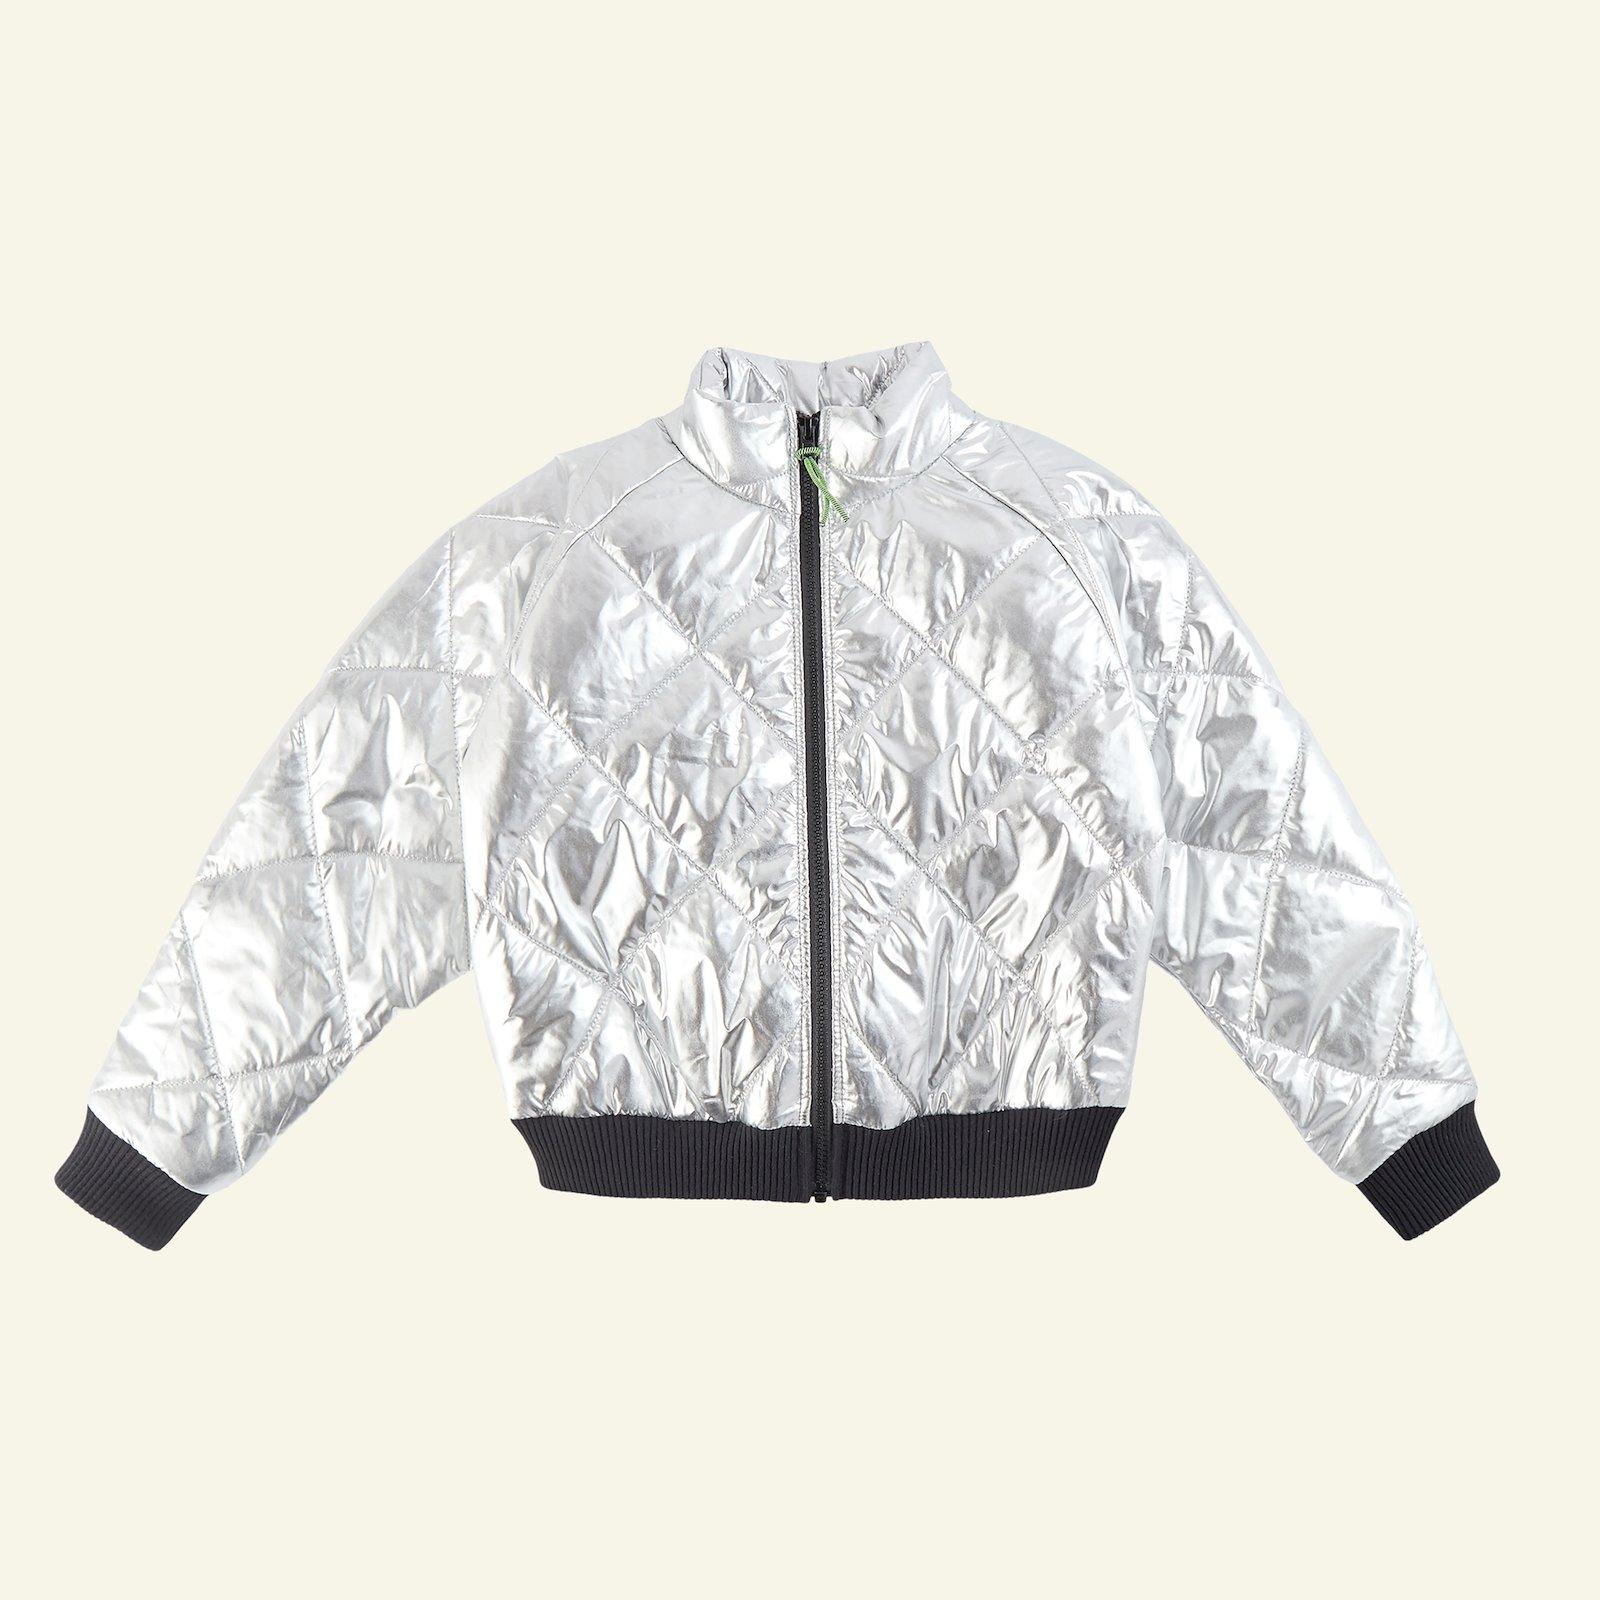 Anorak and jacket, 122/7y p64020_920222_96077_3509072_sskit